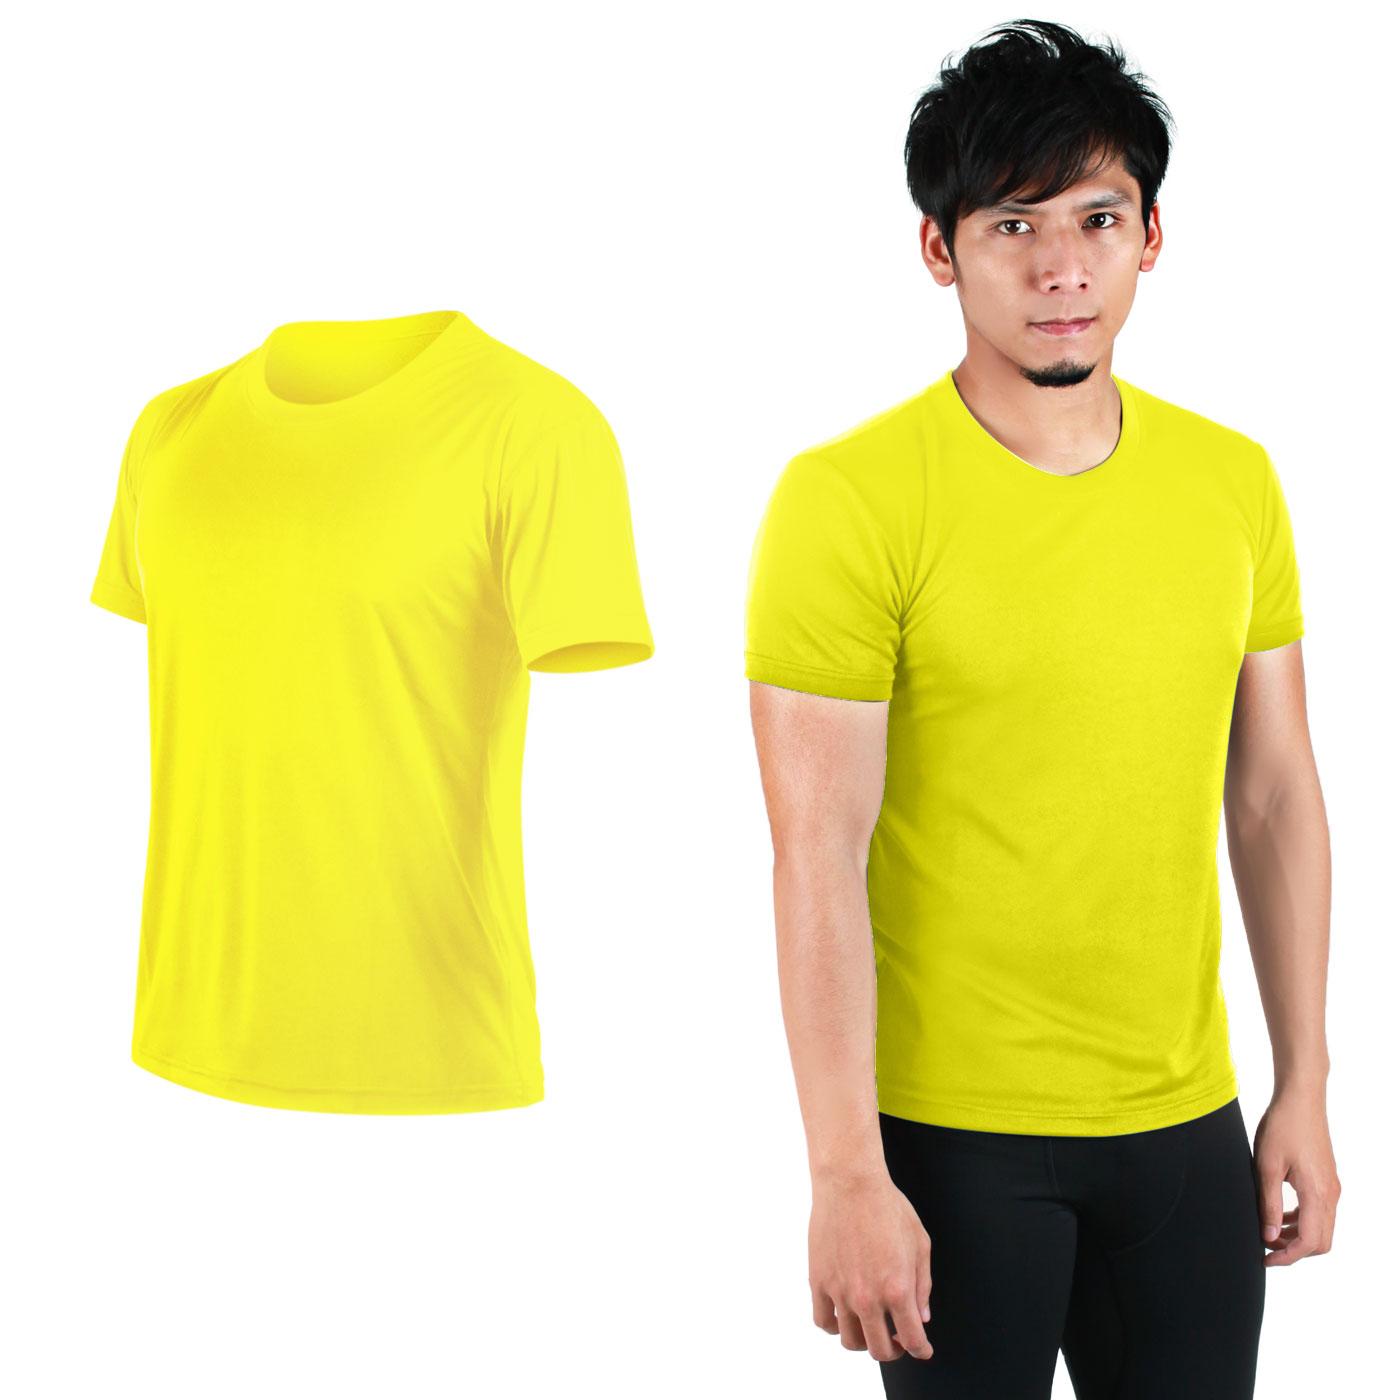 HODARLA FLARE 100 吸濕排汗衫3108301 - 亮黃